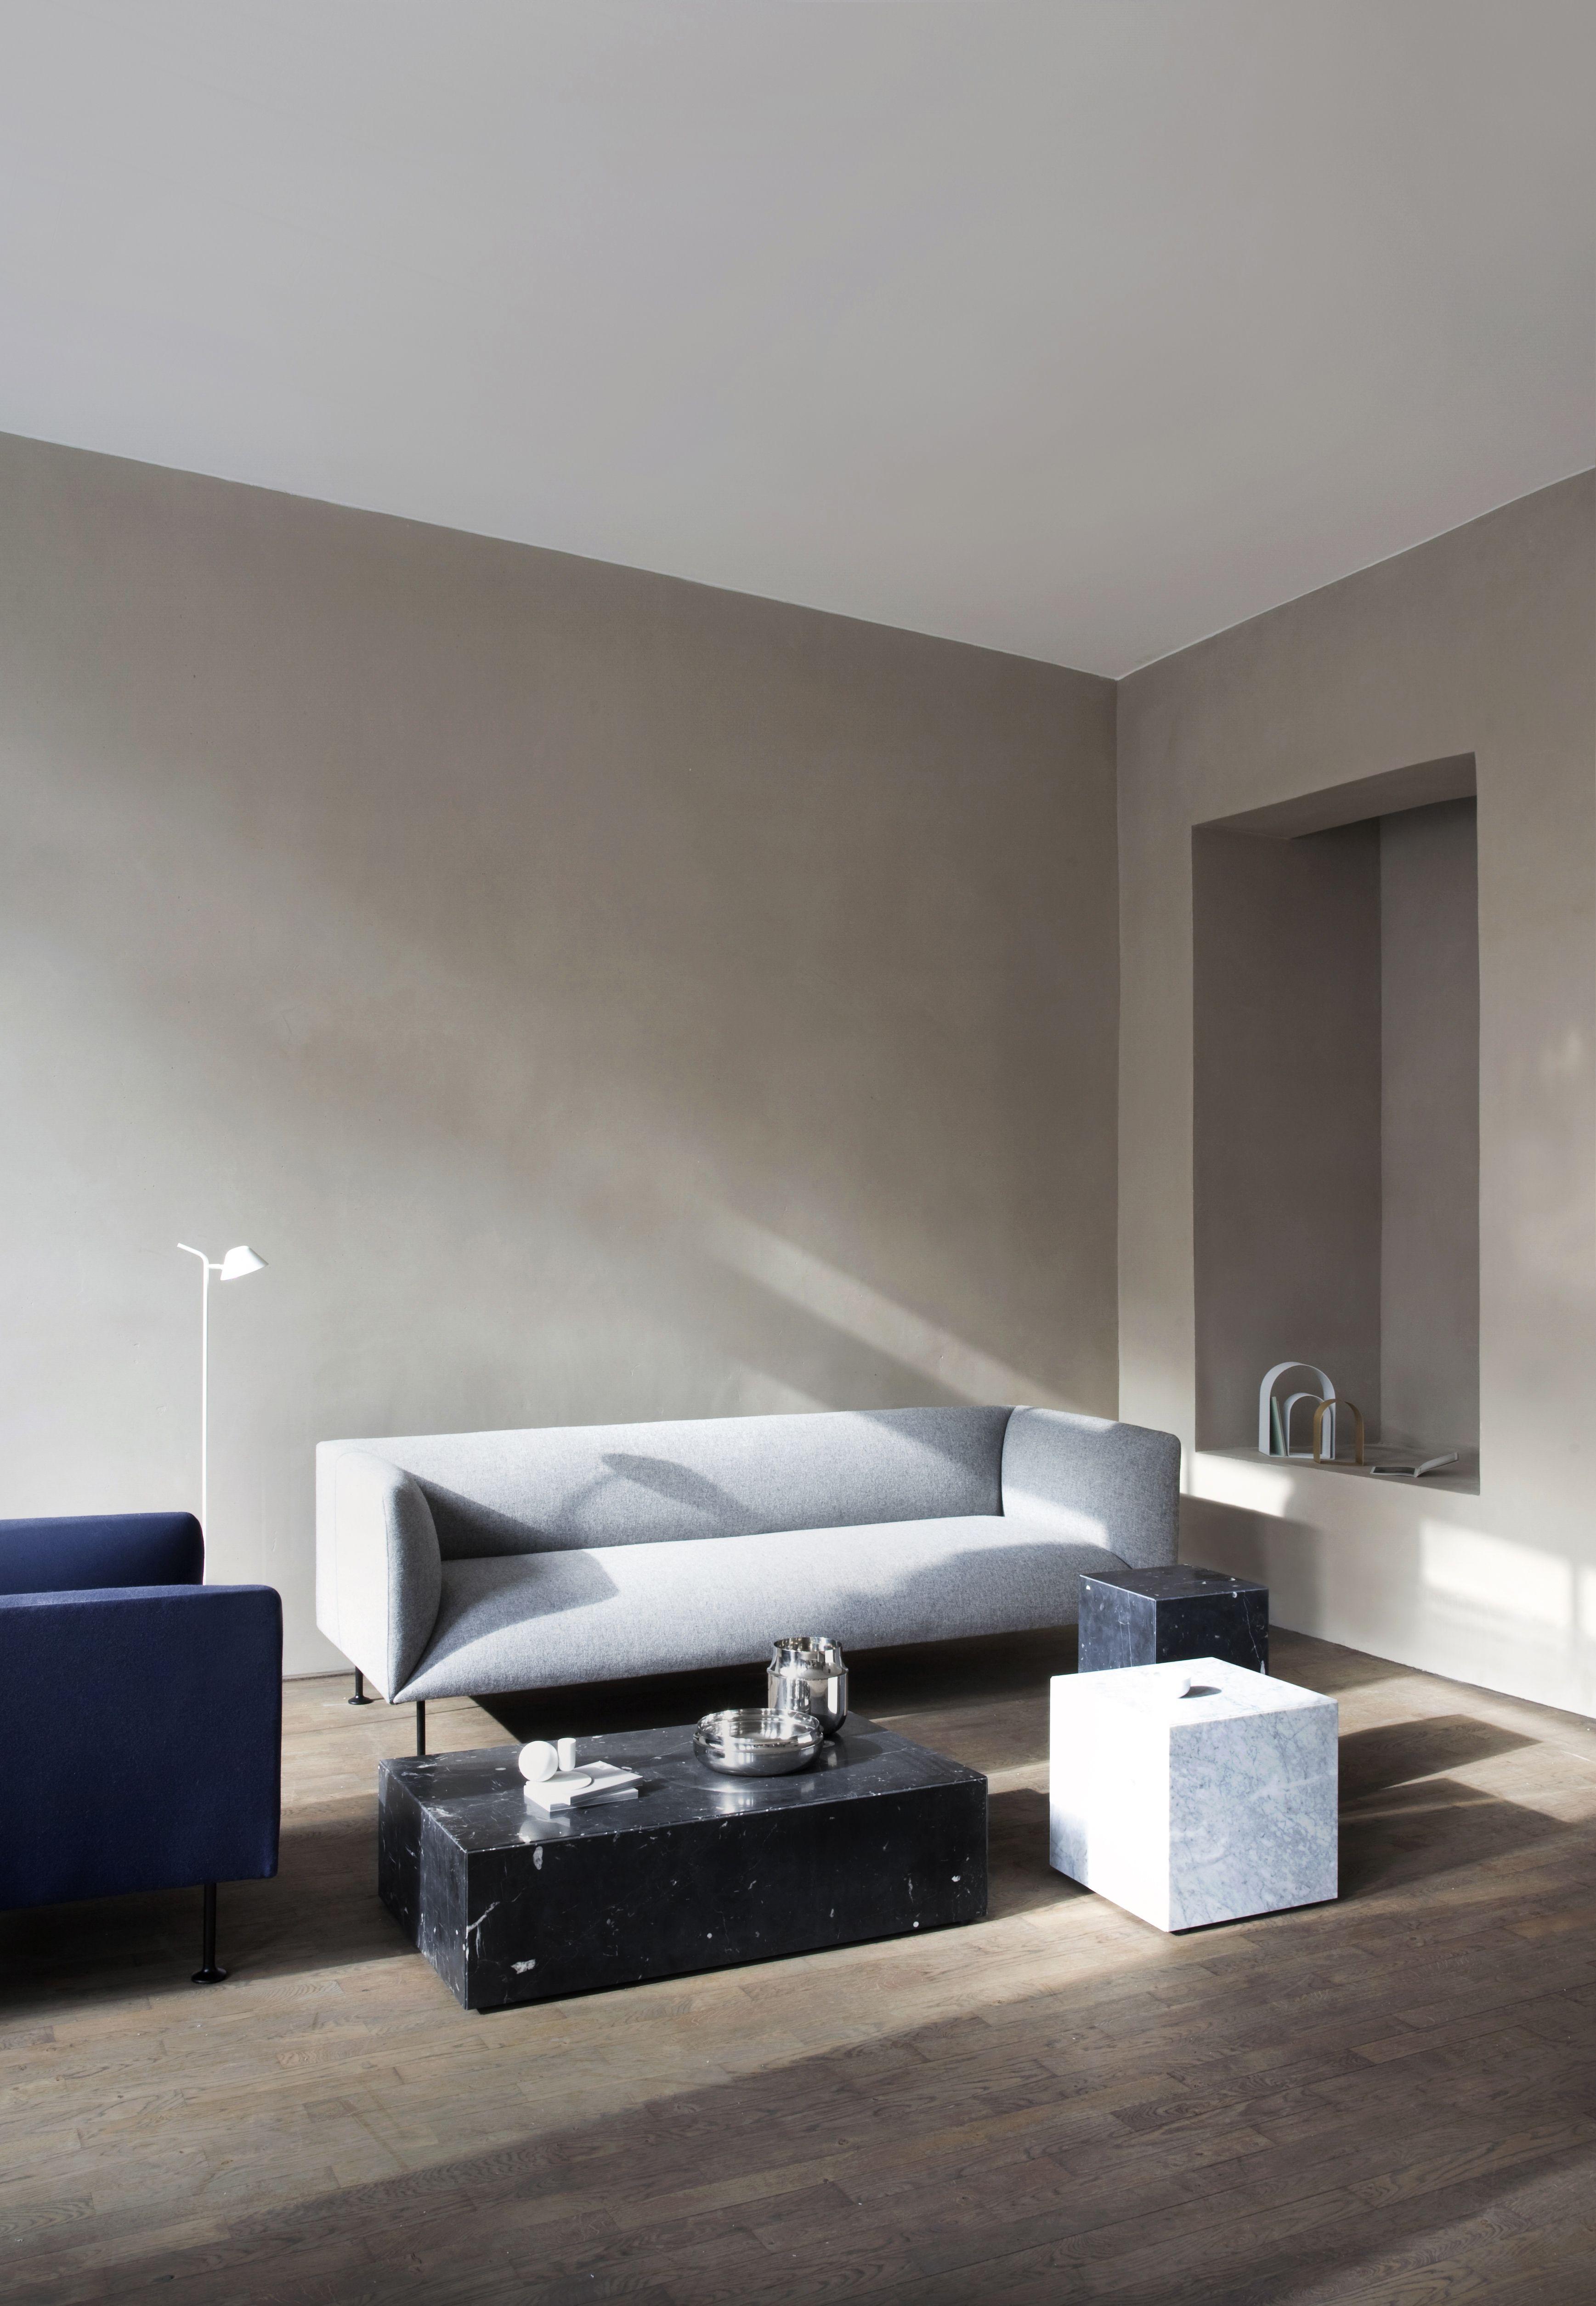 MENU, Location Pictures, Kinfolk Studio, Godot Couch, Plinth ...